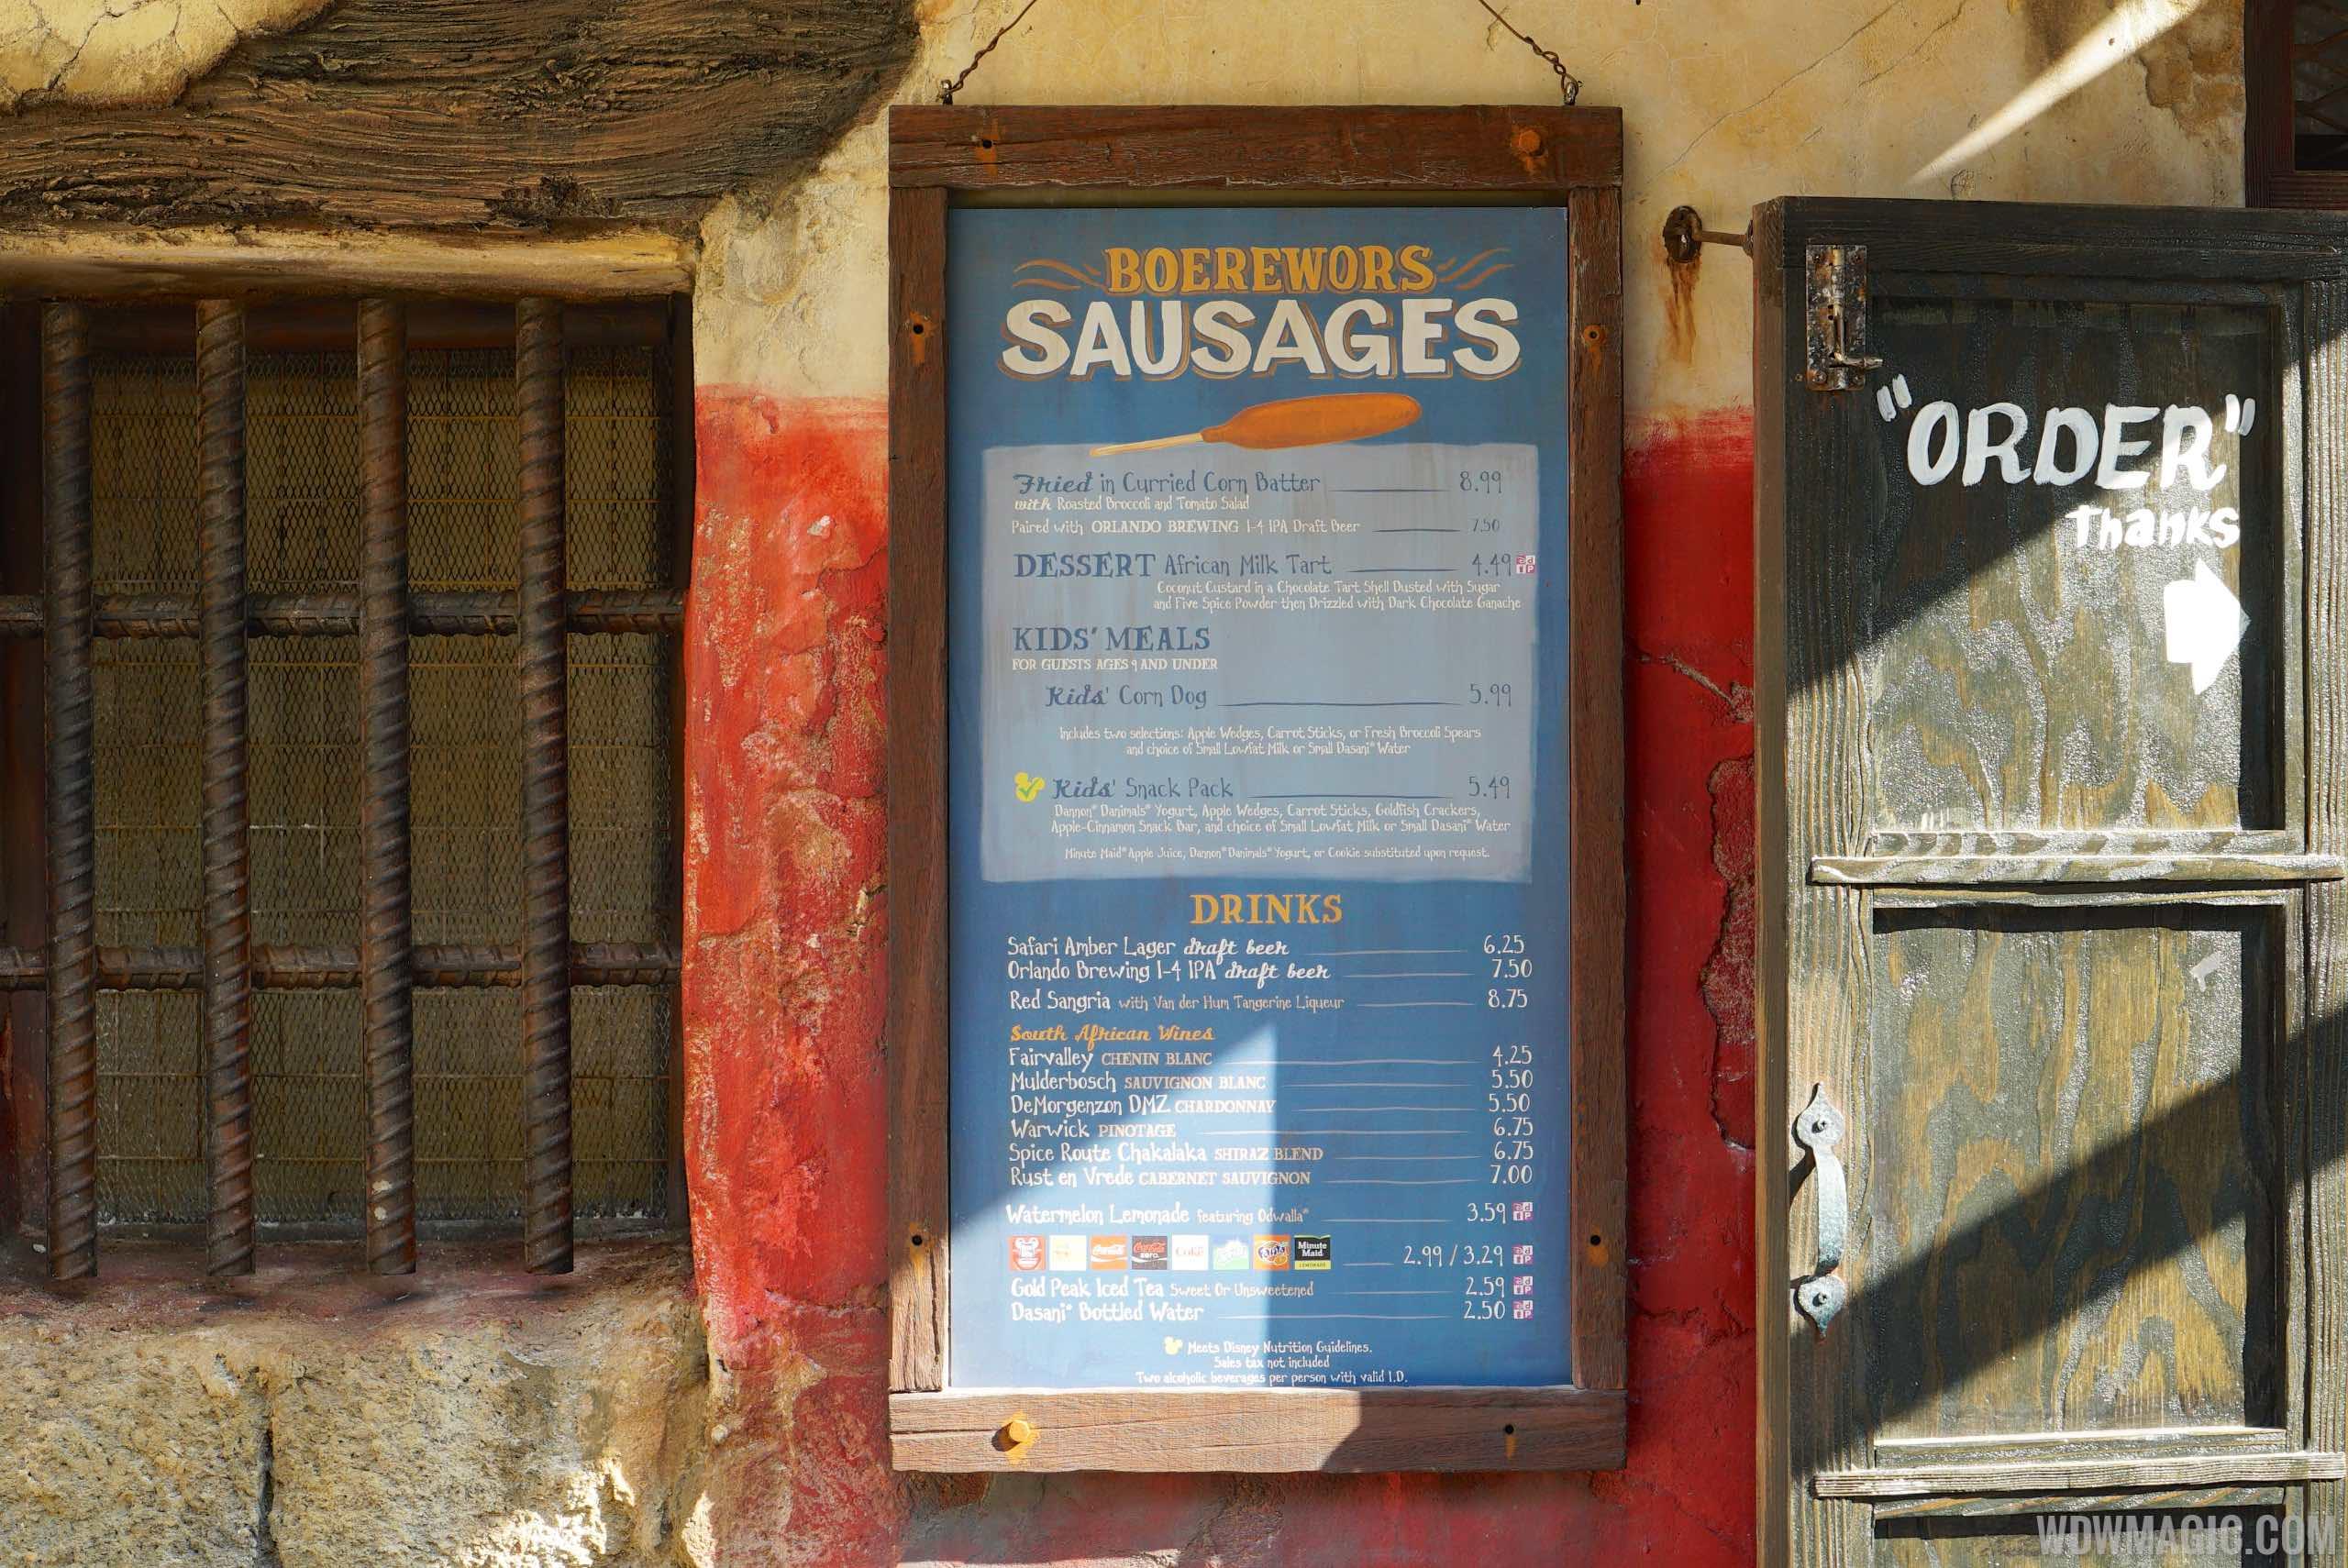 Harambe Market menu - Boerewors Famous Sausages